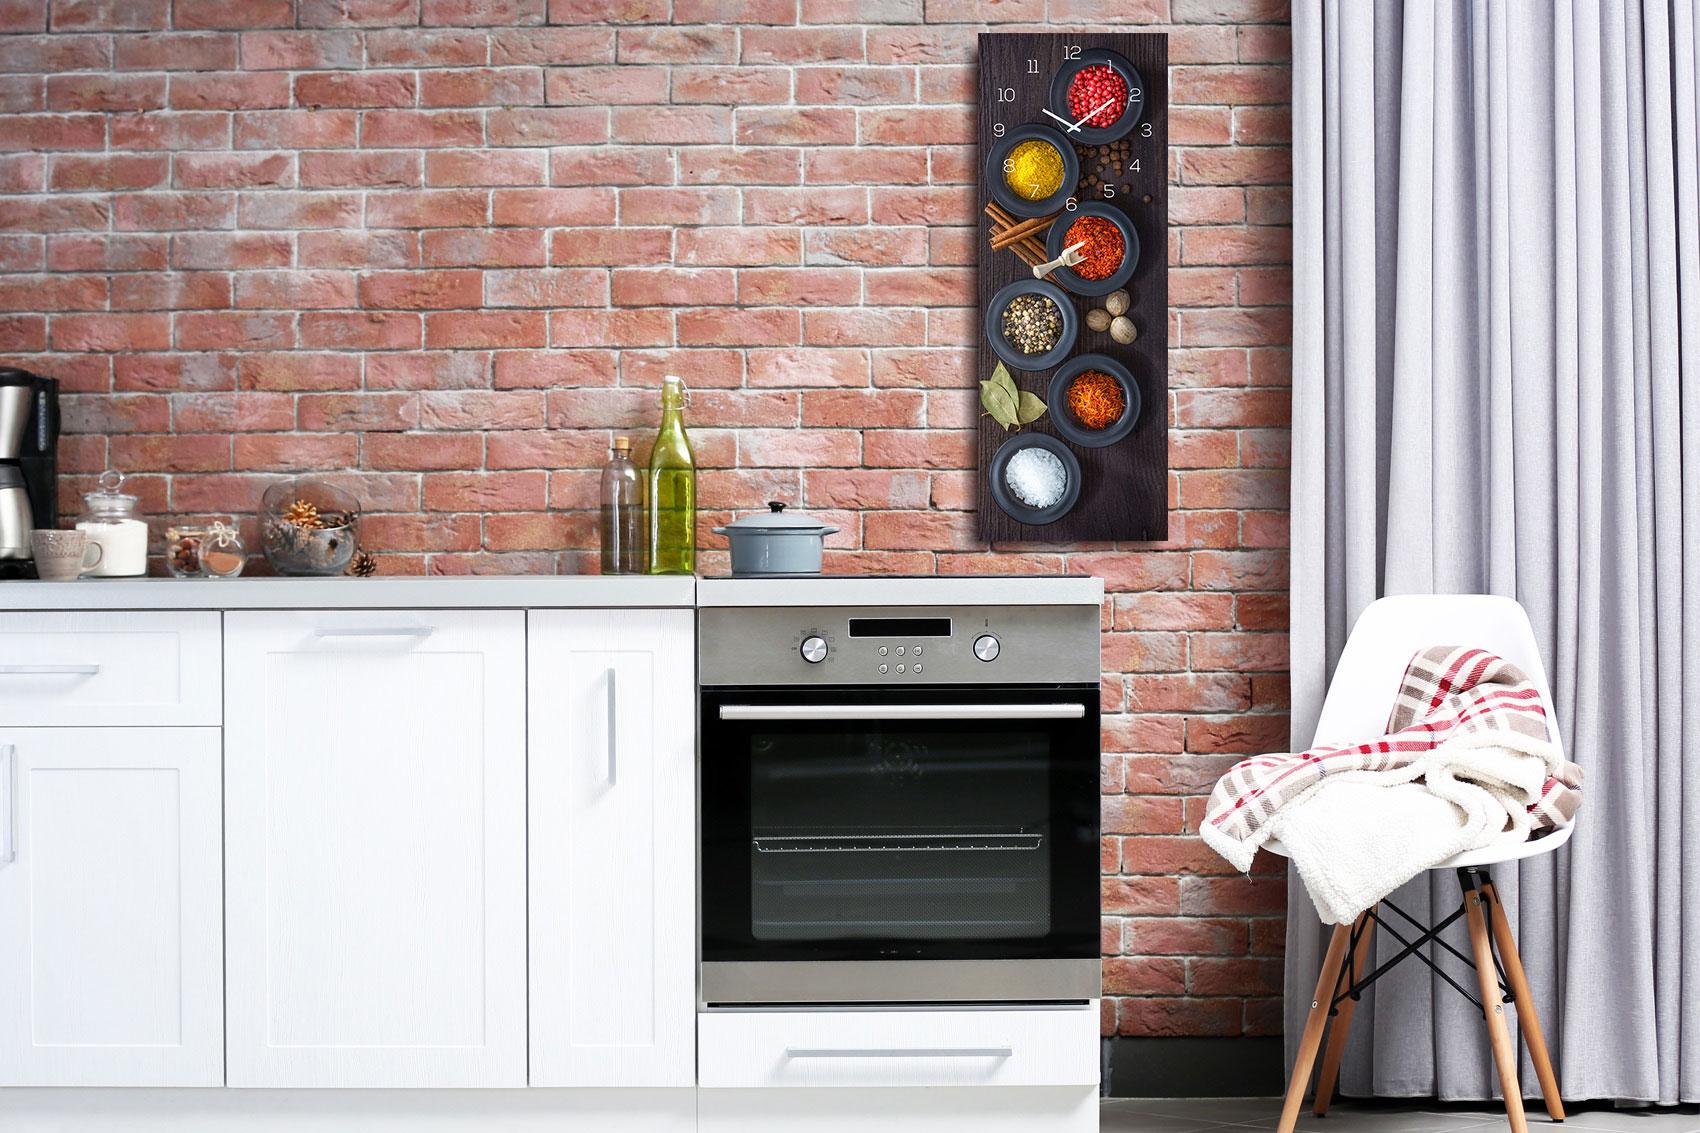 Full Size of Wanddeko Küche Wanddeko Küche Pinterest Wanddeko Küche Bilder Wanddeko Küche Vintage Küche Wanddeko Küche